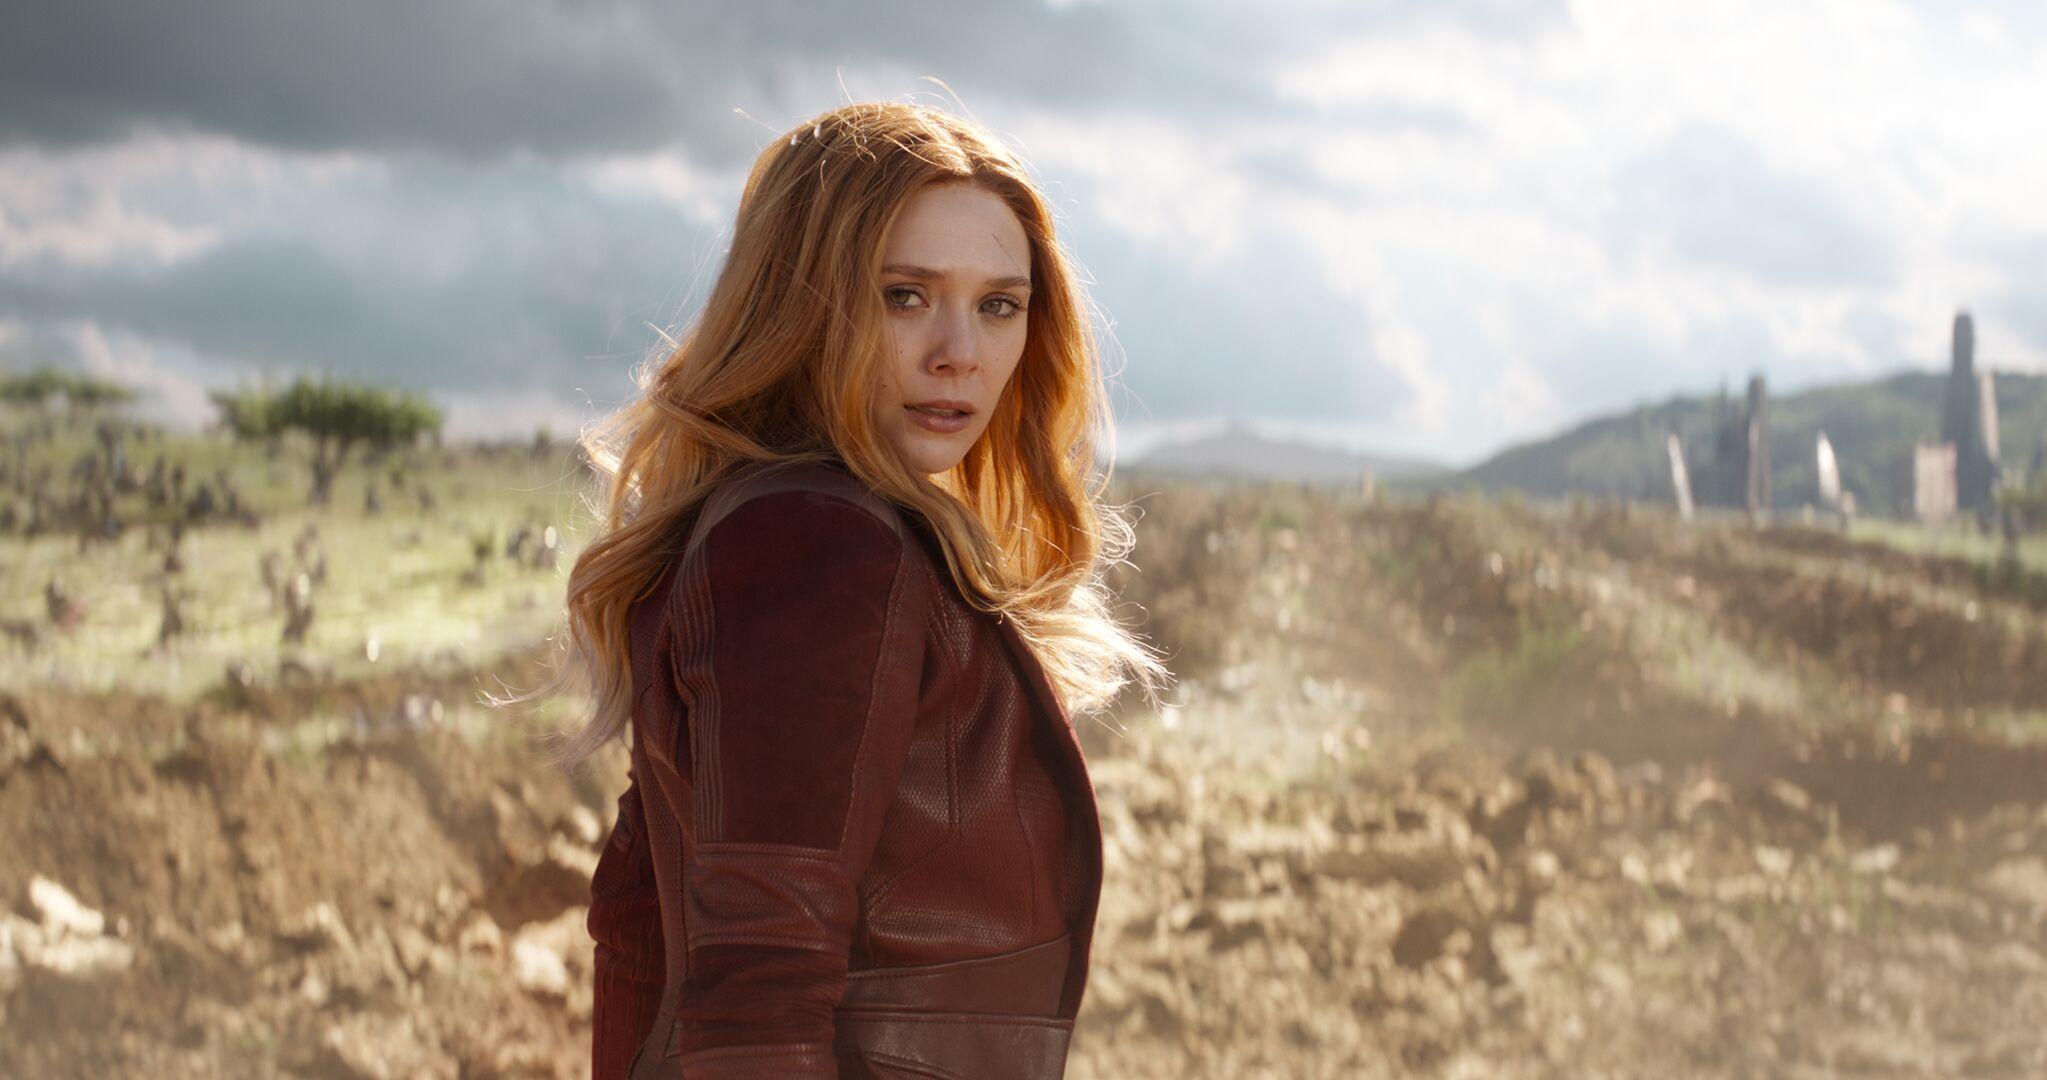 Scarlet Witch deserves better than life as a convenient MCU plot device